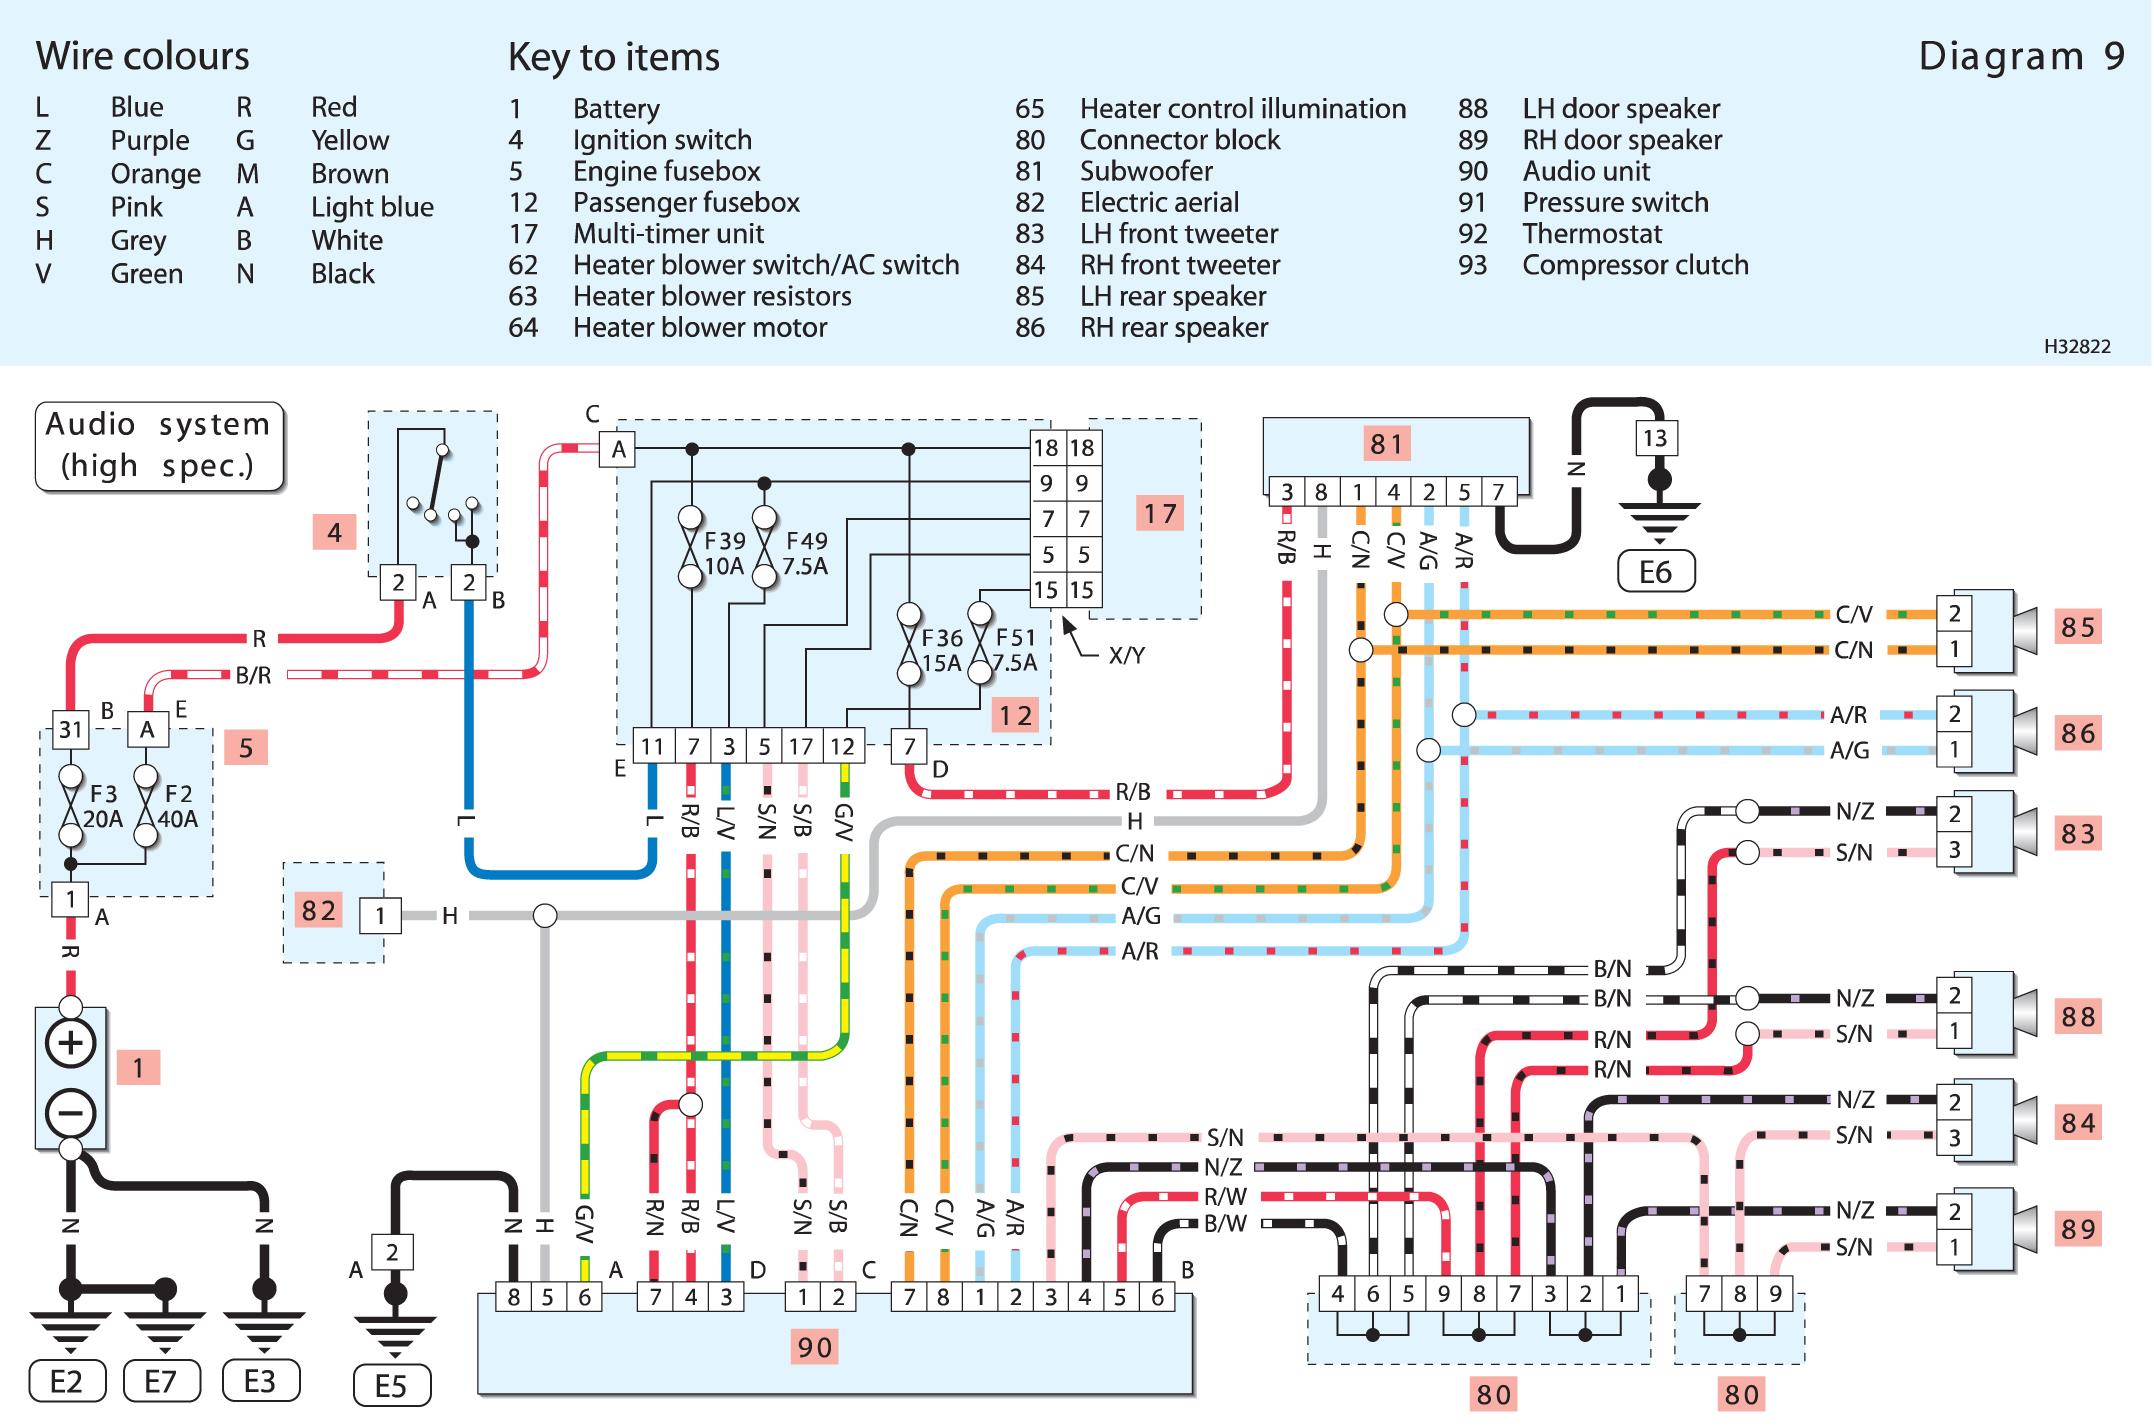 fiat 128 dan wiring distributor ignition coil wiring diagram, Wiring diagram